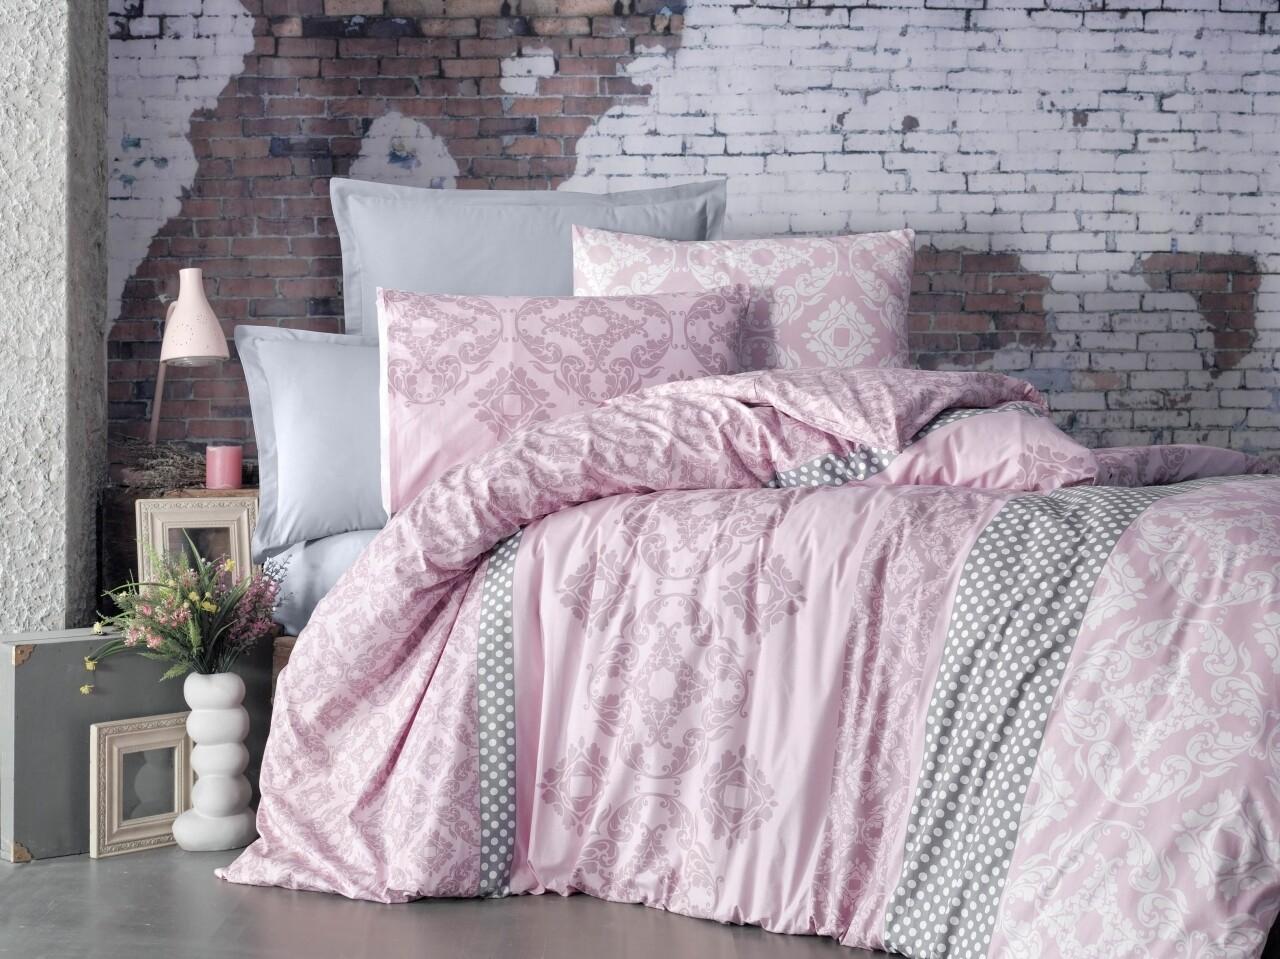 Lenjerie de pat pentru doua persoane, Paix Bedora, Bumbac Ranforce, 6 piese